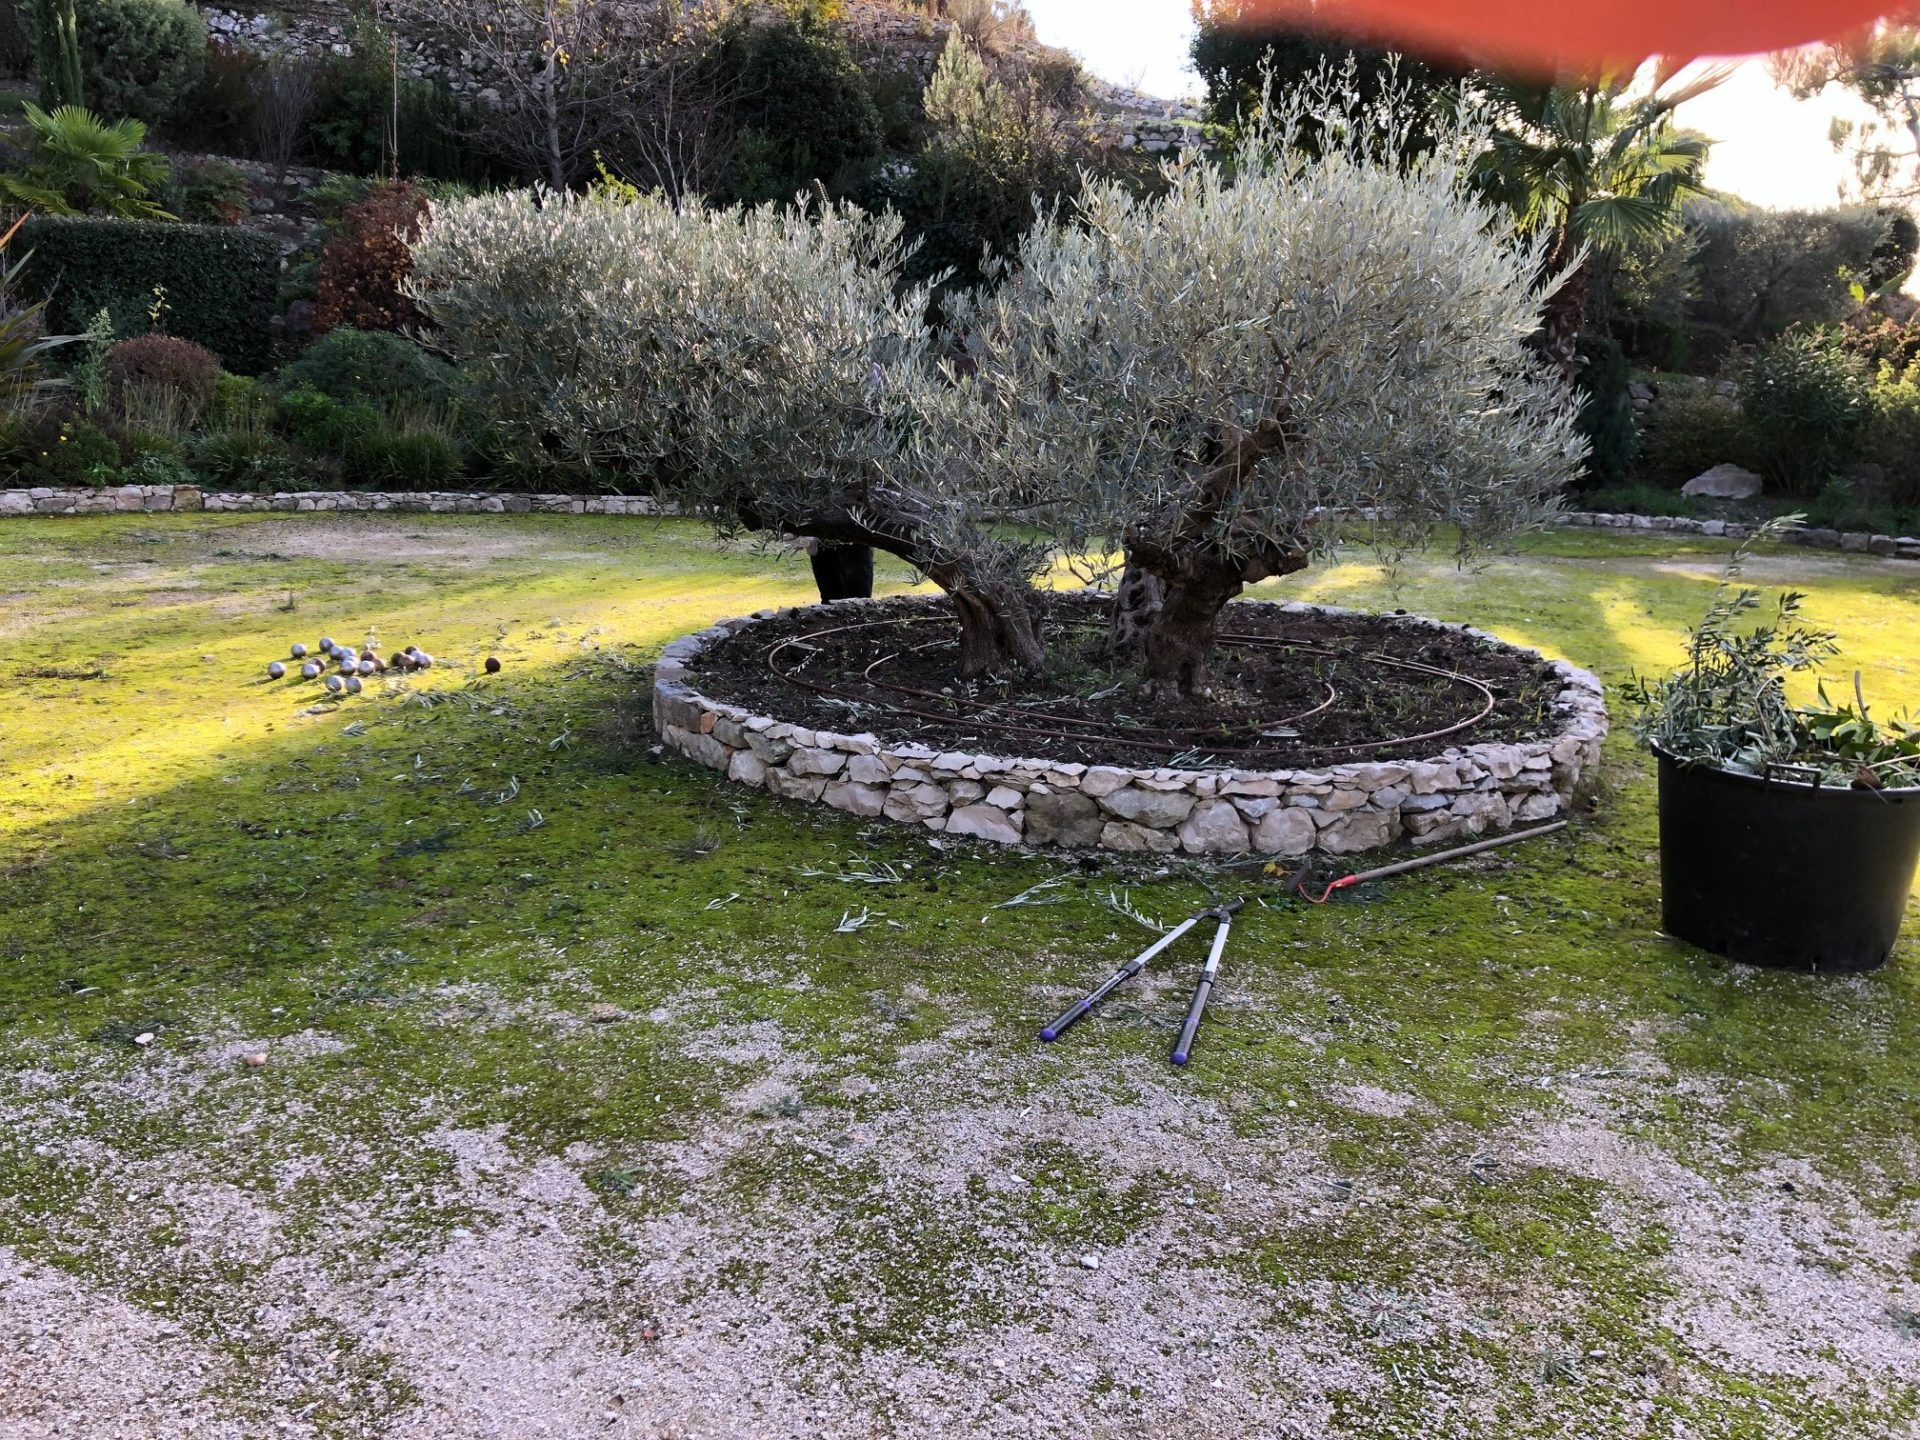 entretien olivier cassis aubagne jardin paca